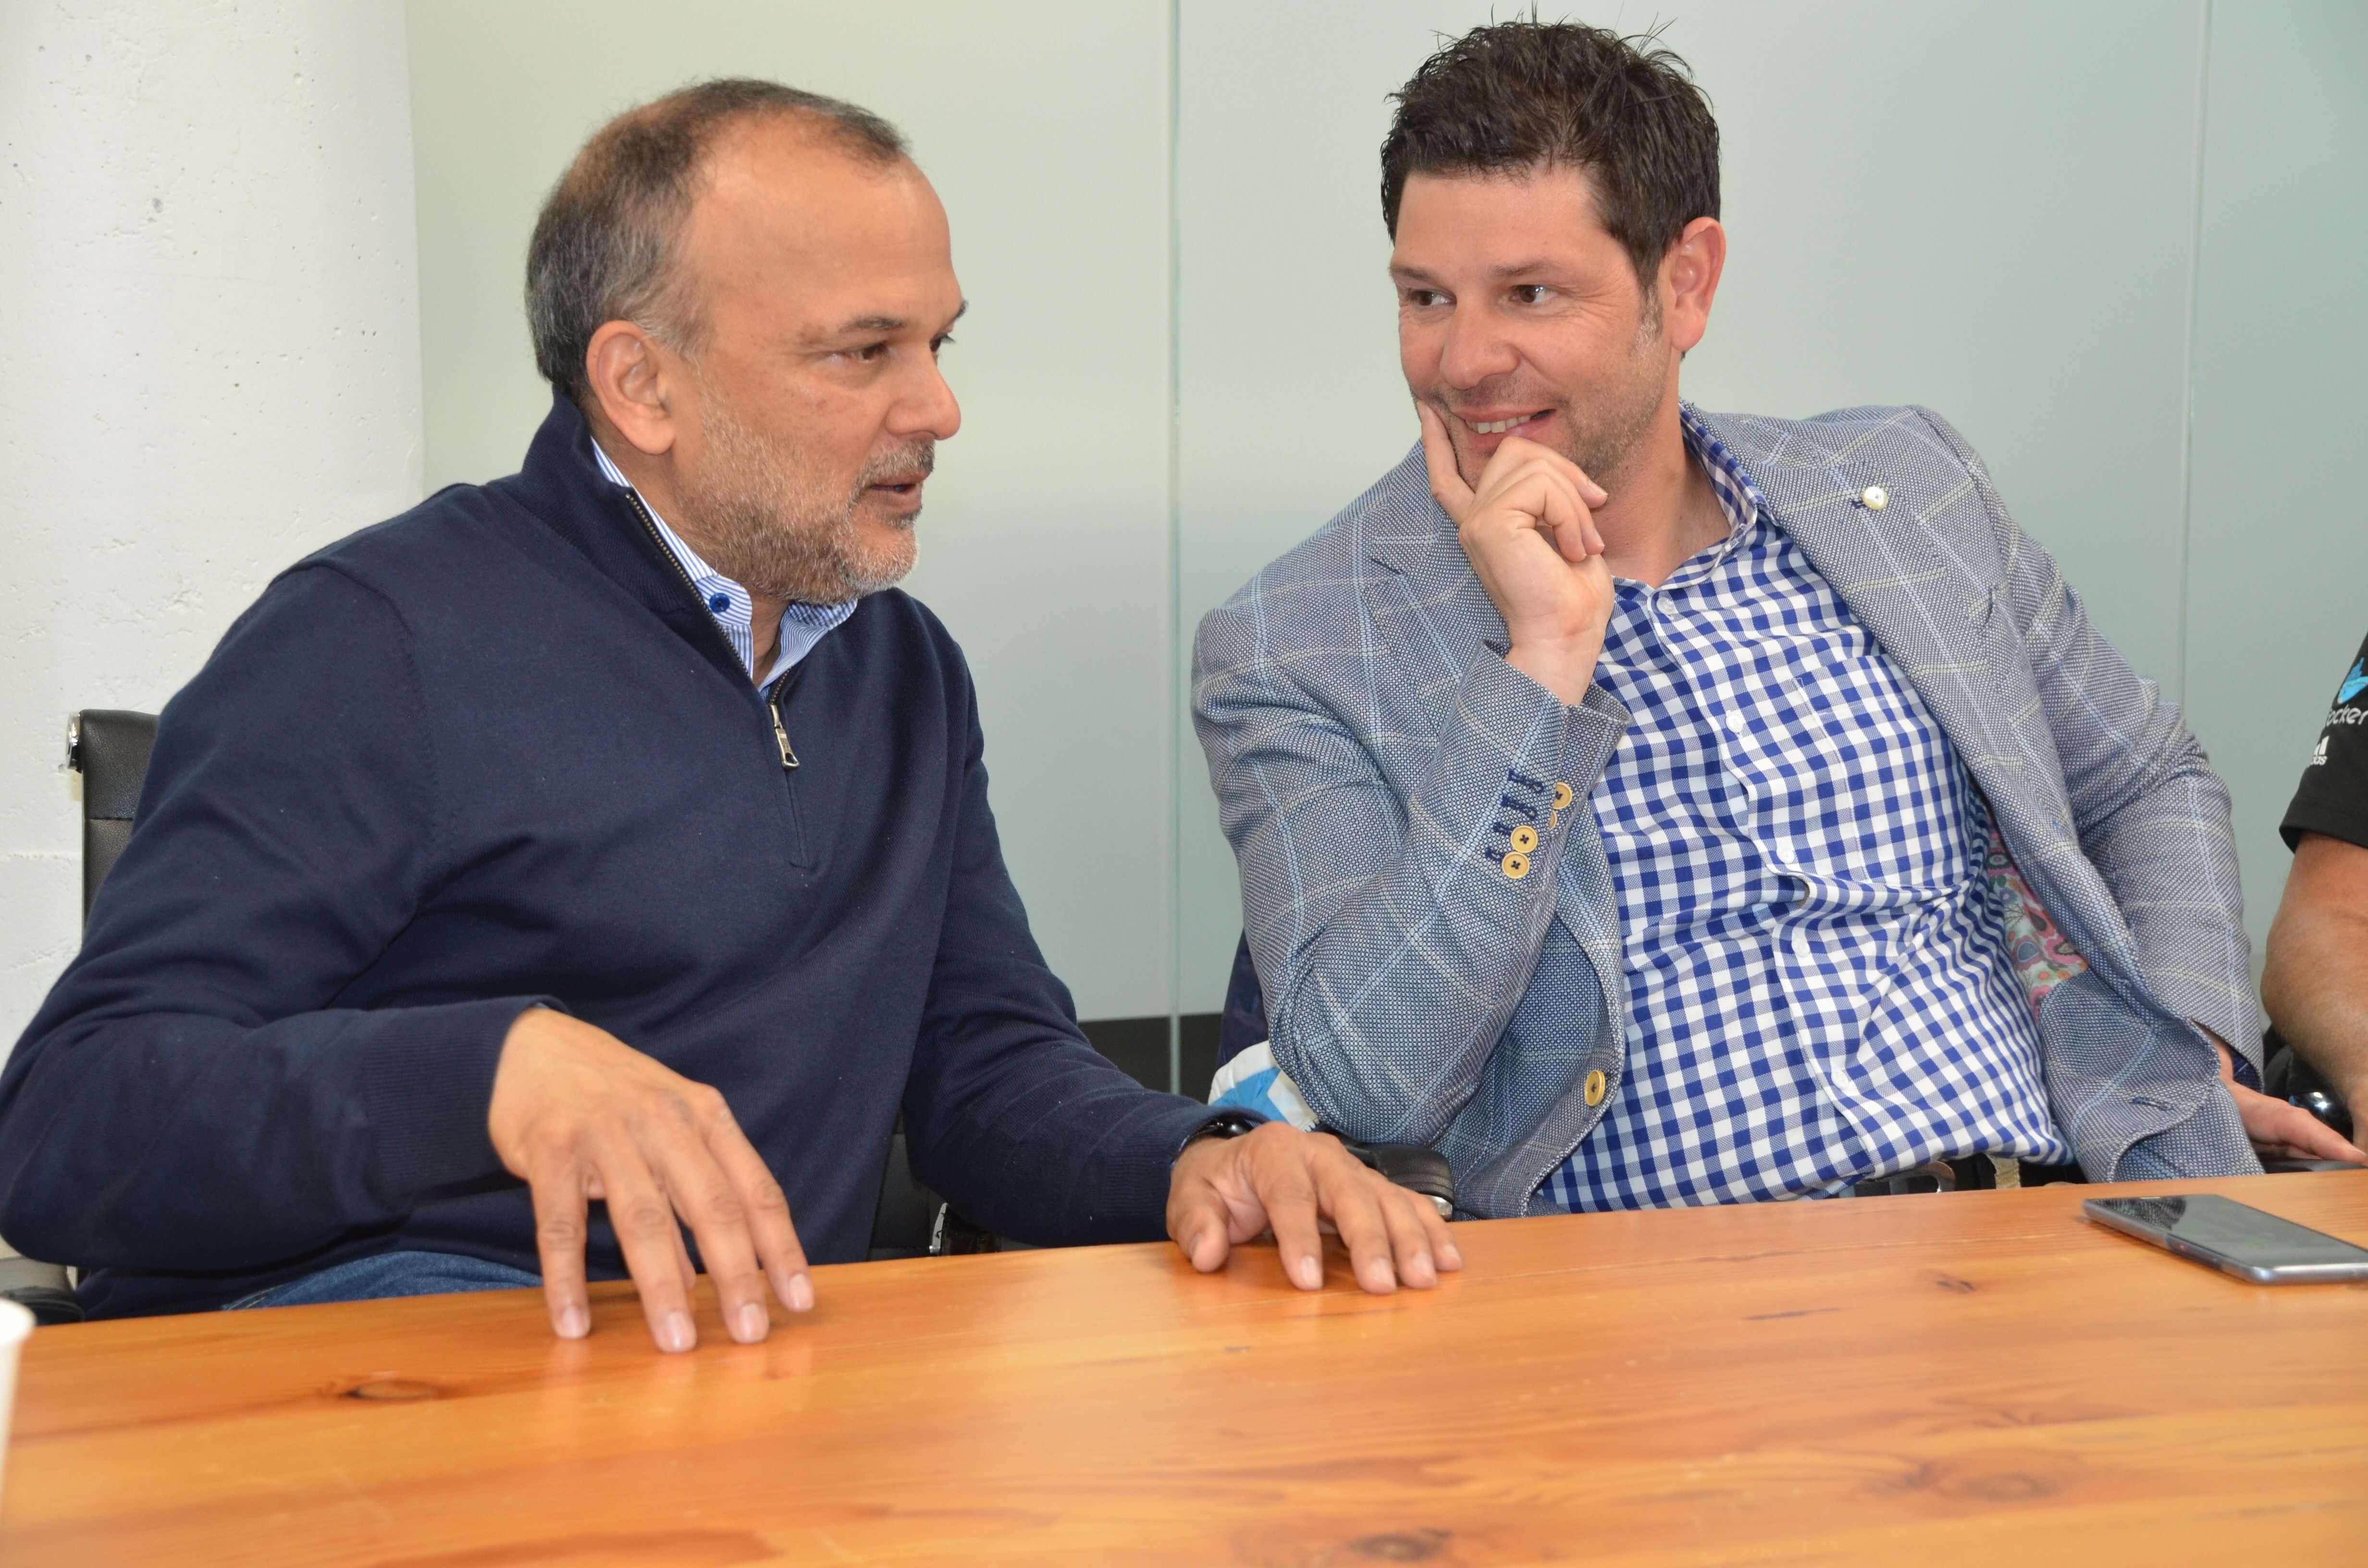 Pascal-Schmid-CEO-netrics-im-Gespraech-mit-Docker-CEO-Steve-Singh-in-San-Francisco